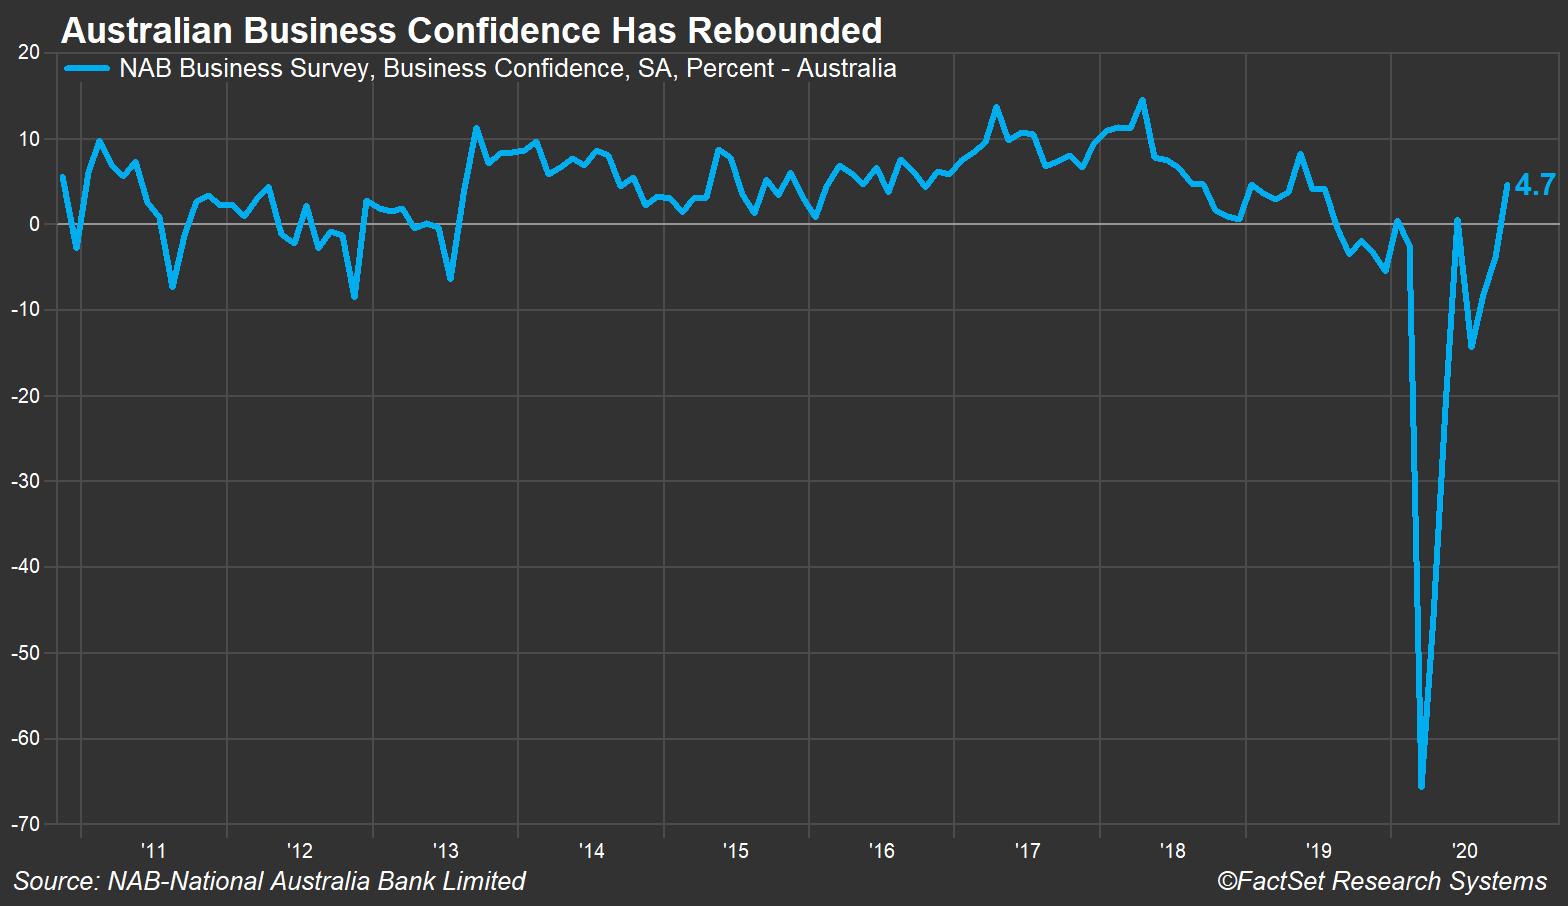 Australian Business Confidence